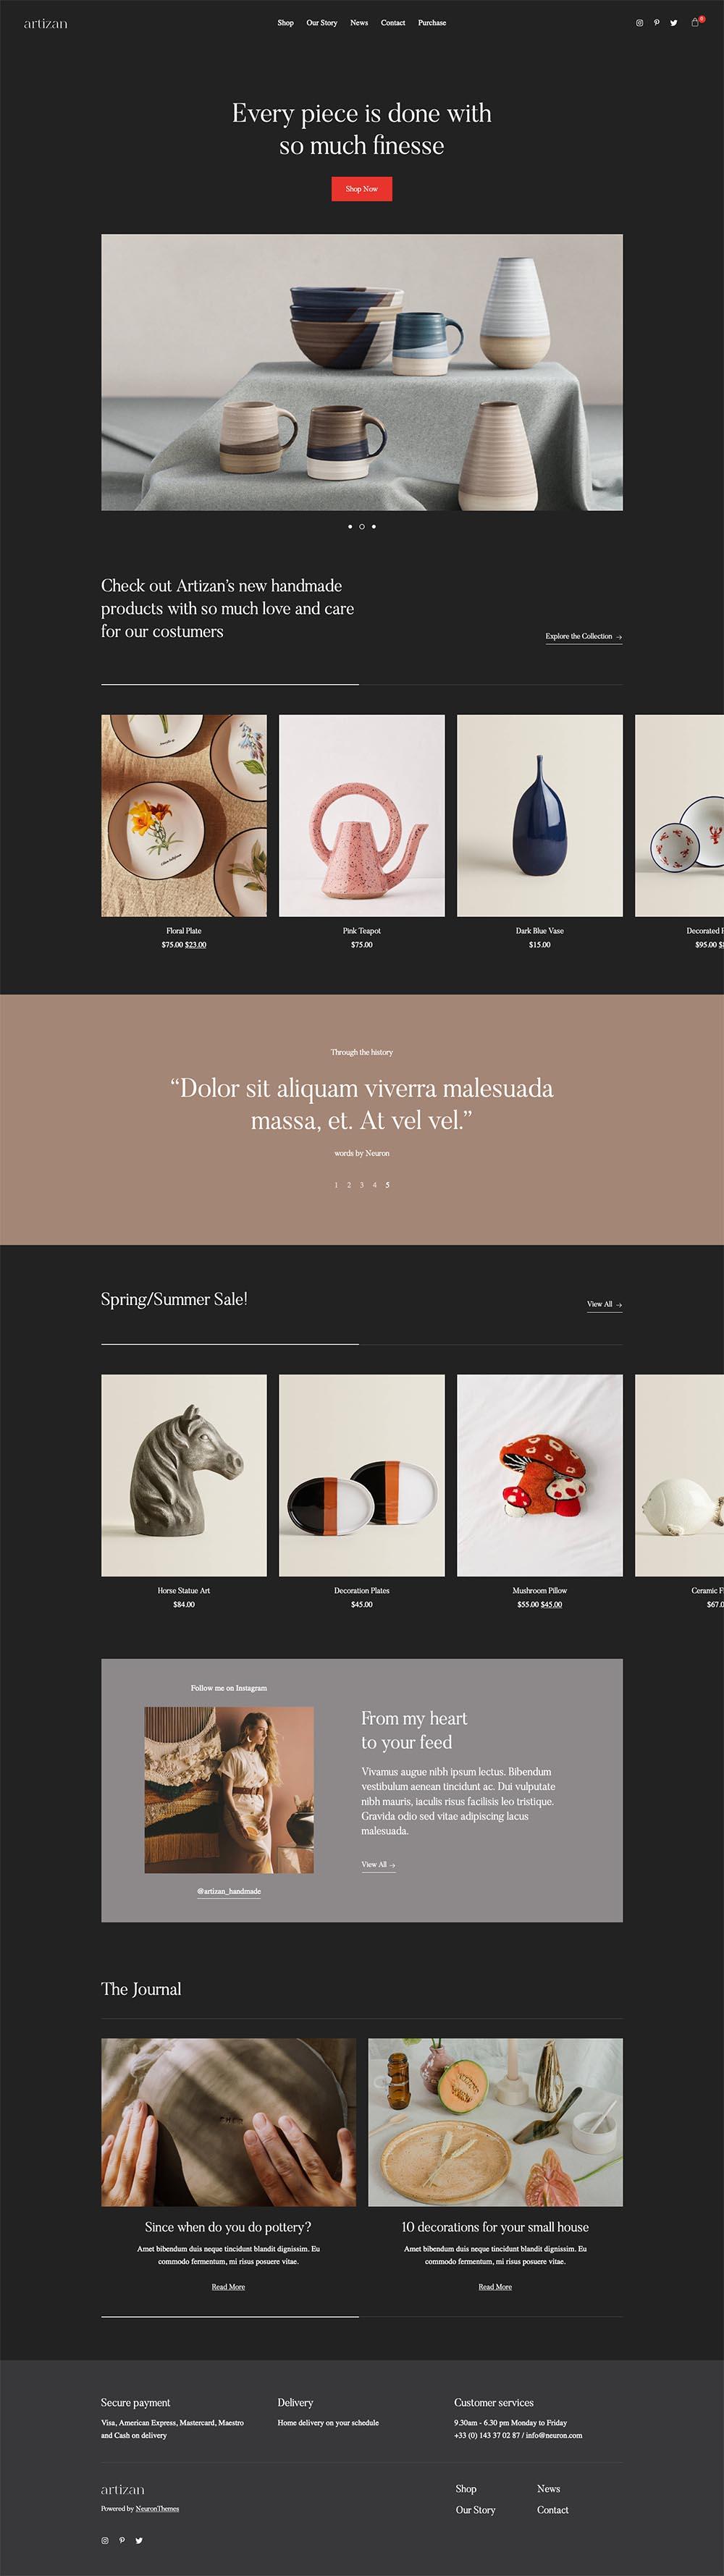 Artizan Elegant eCommerce Store Demo Website for WordPress